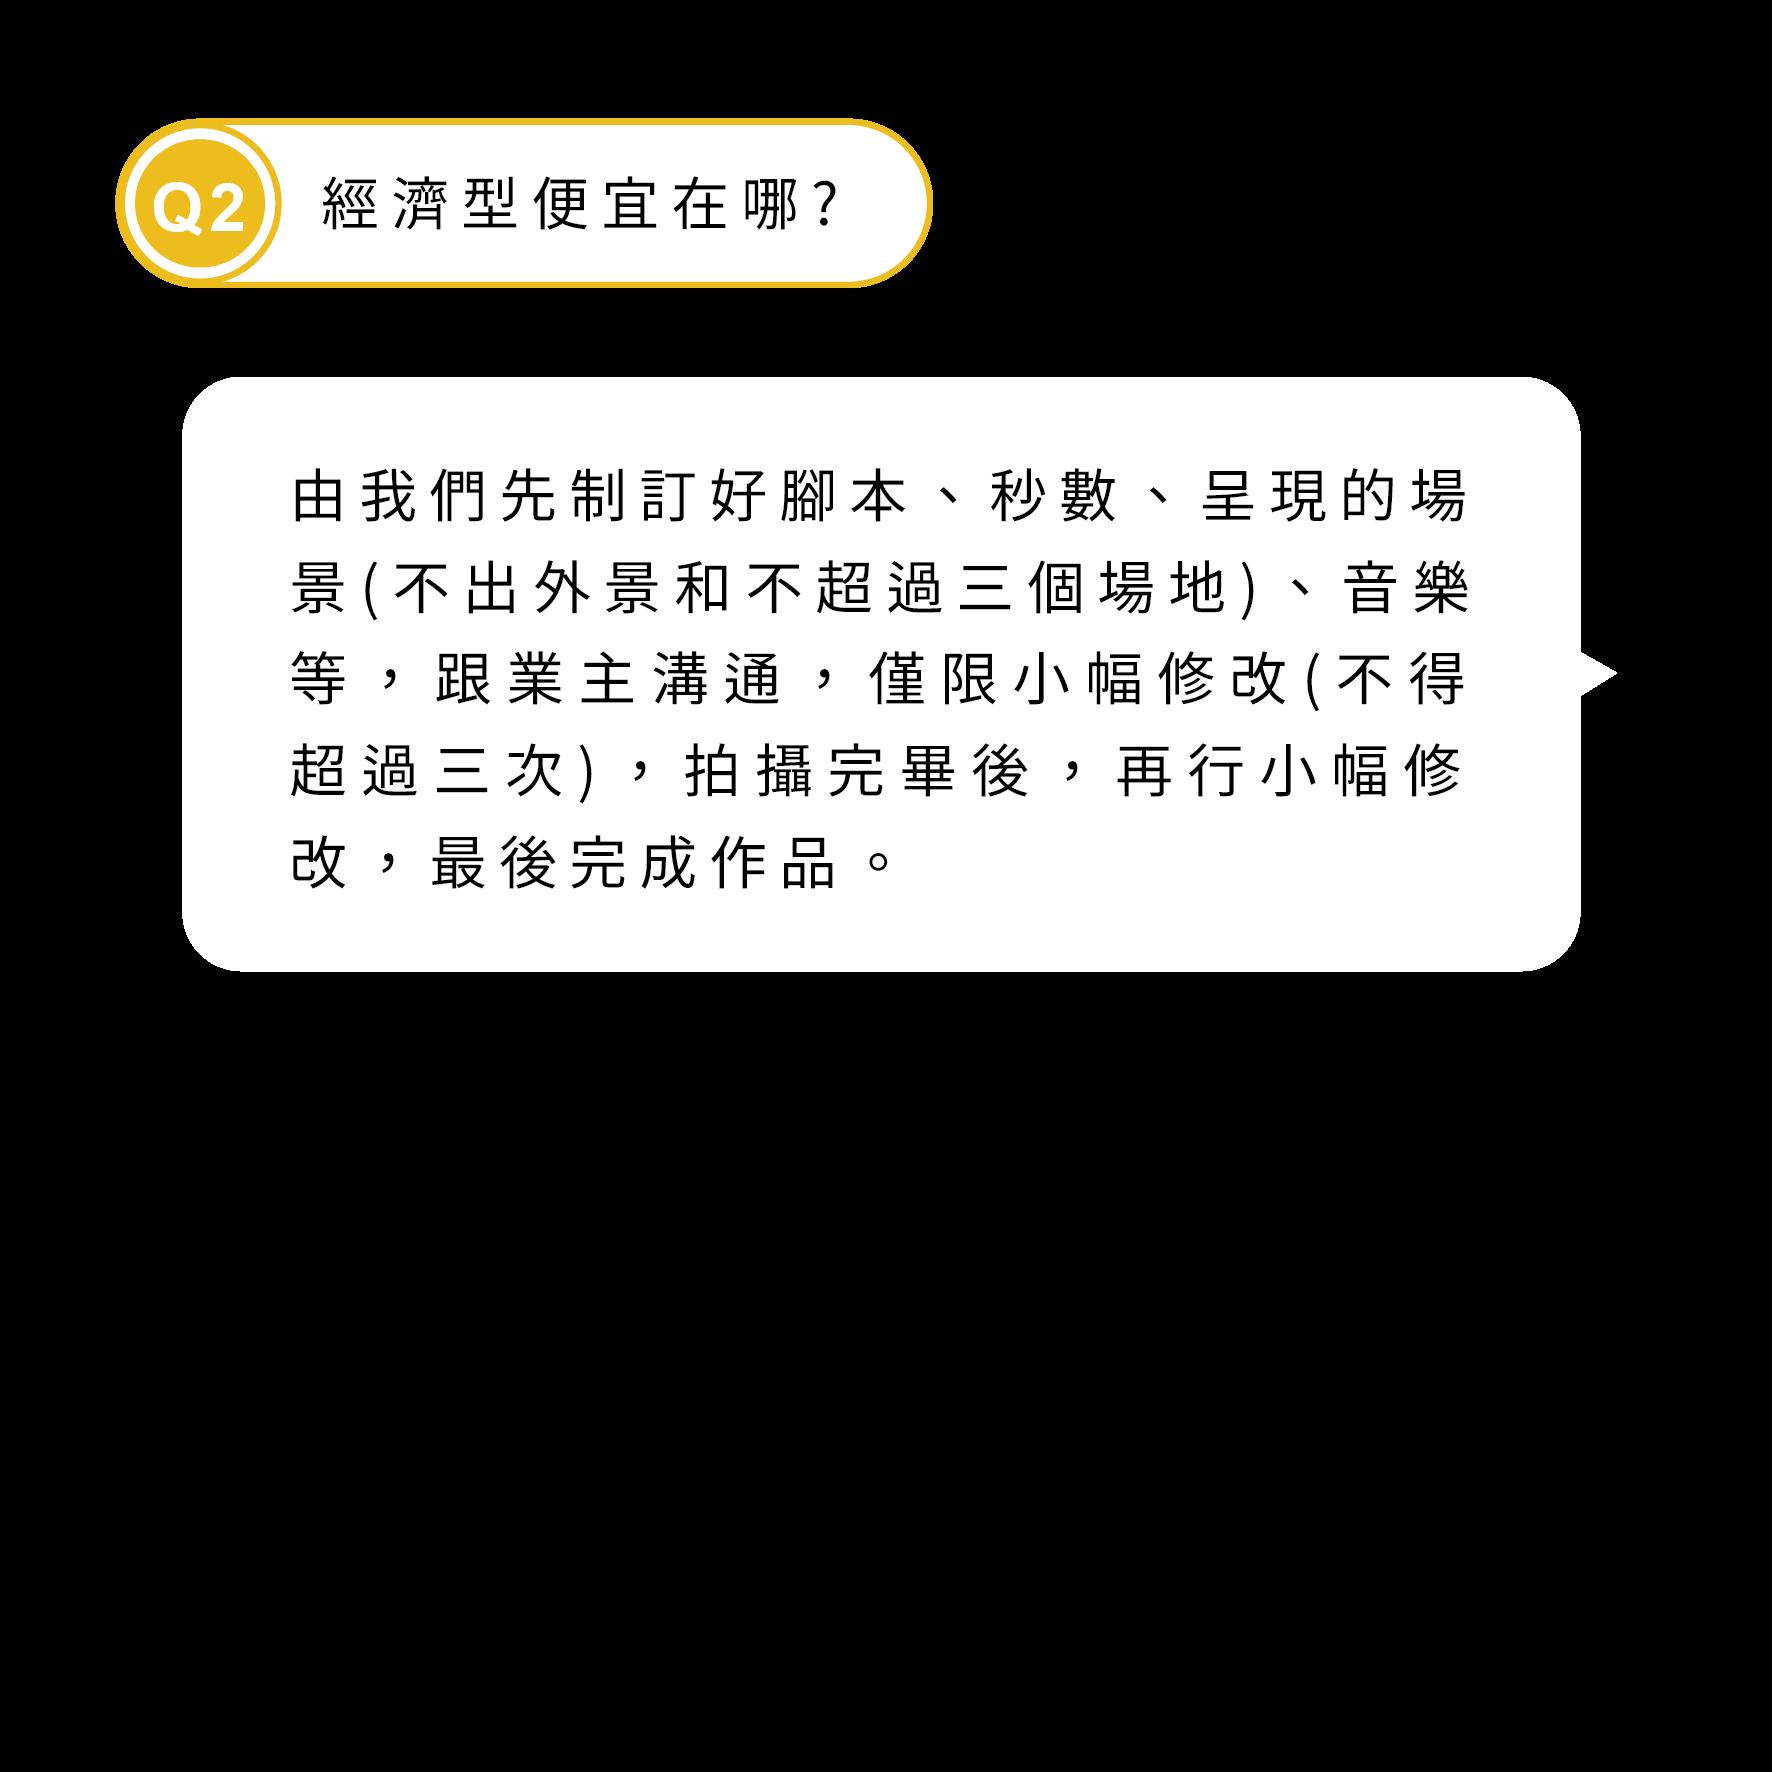 Q2 (1)